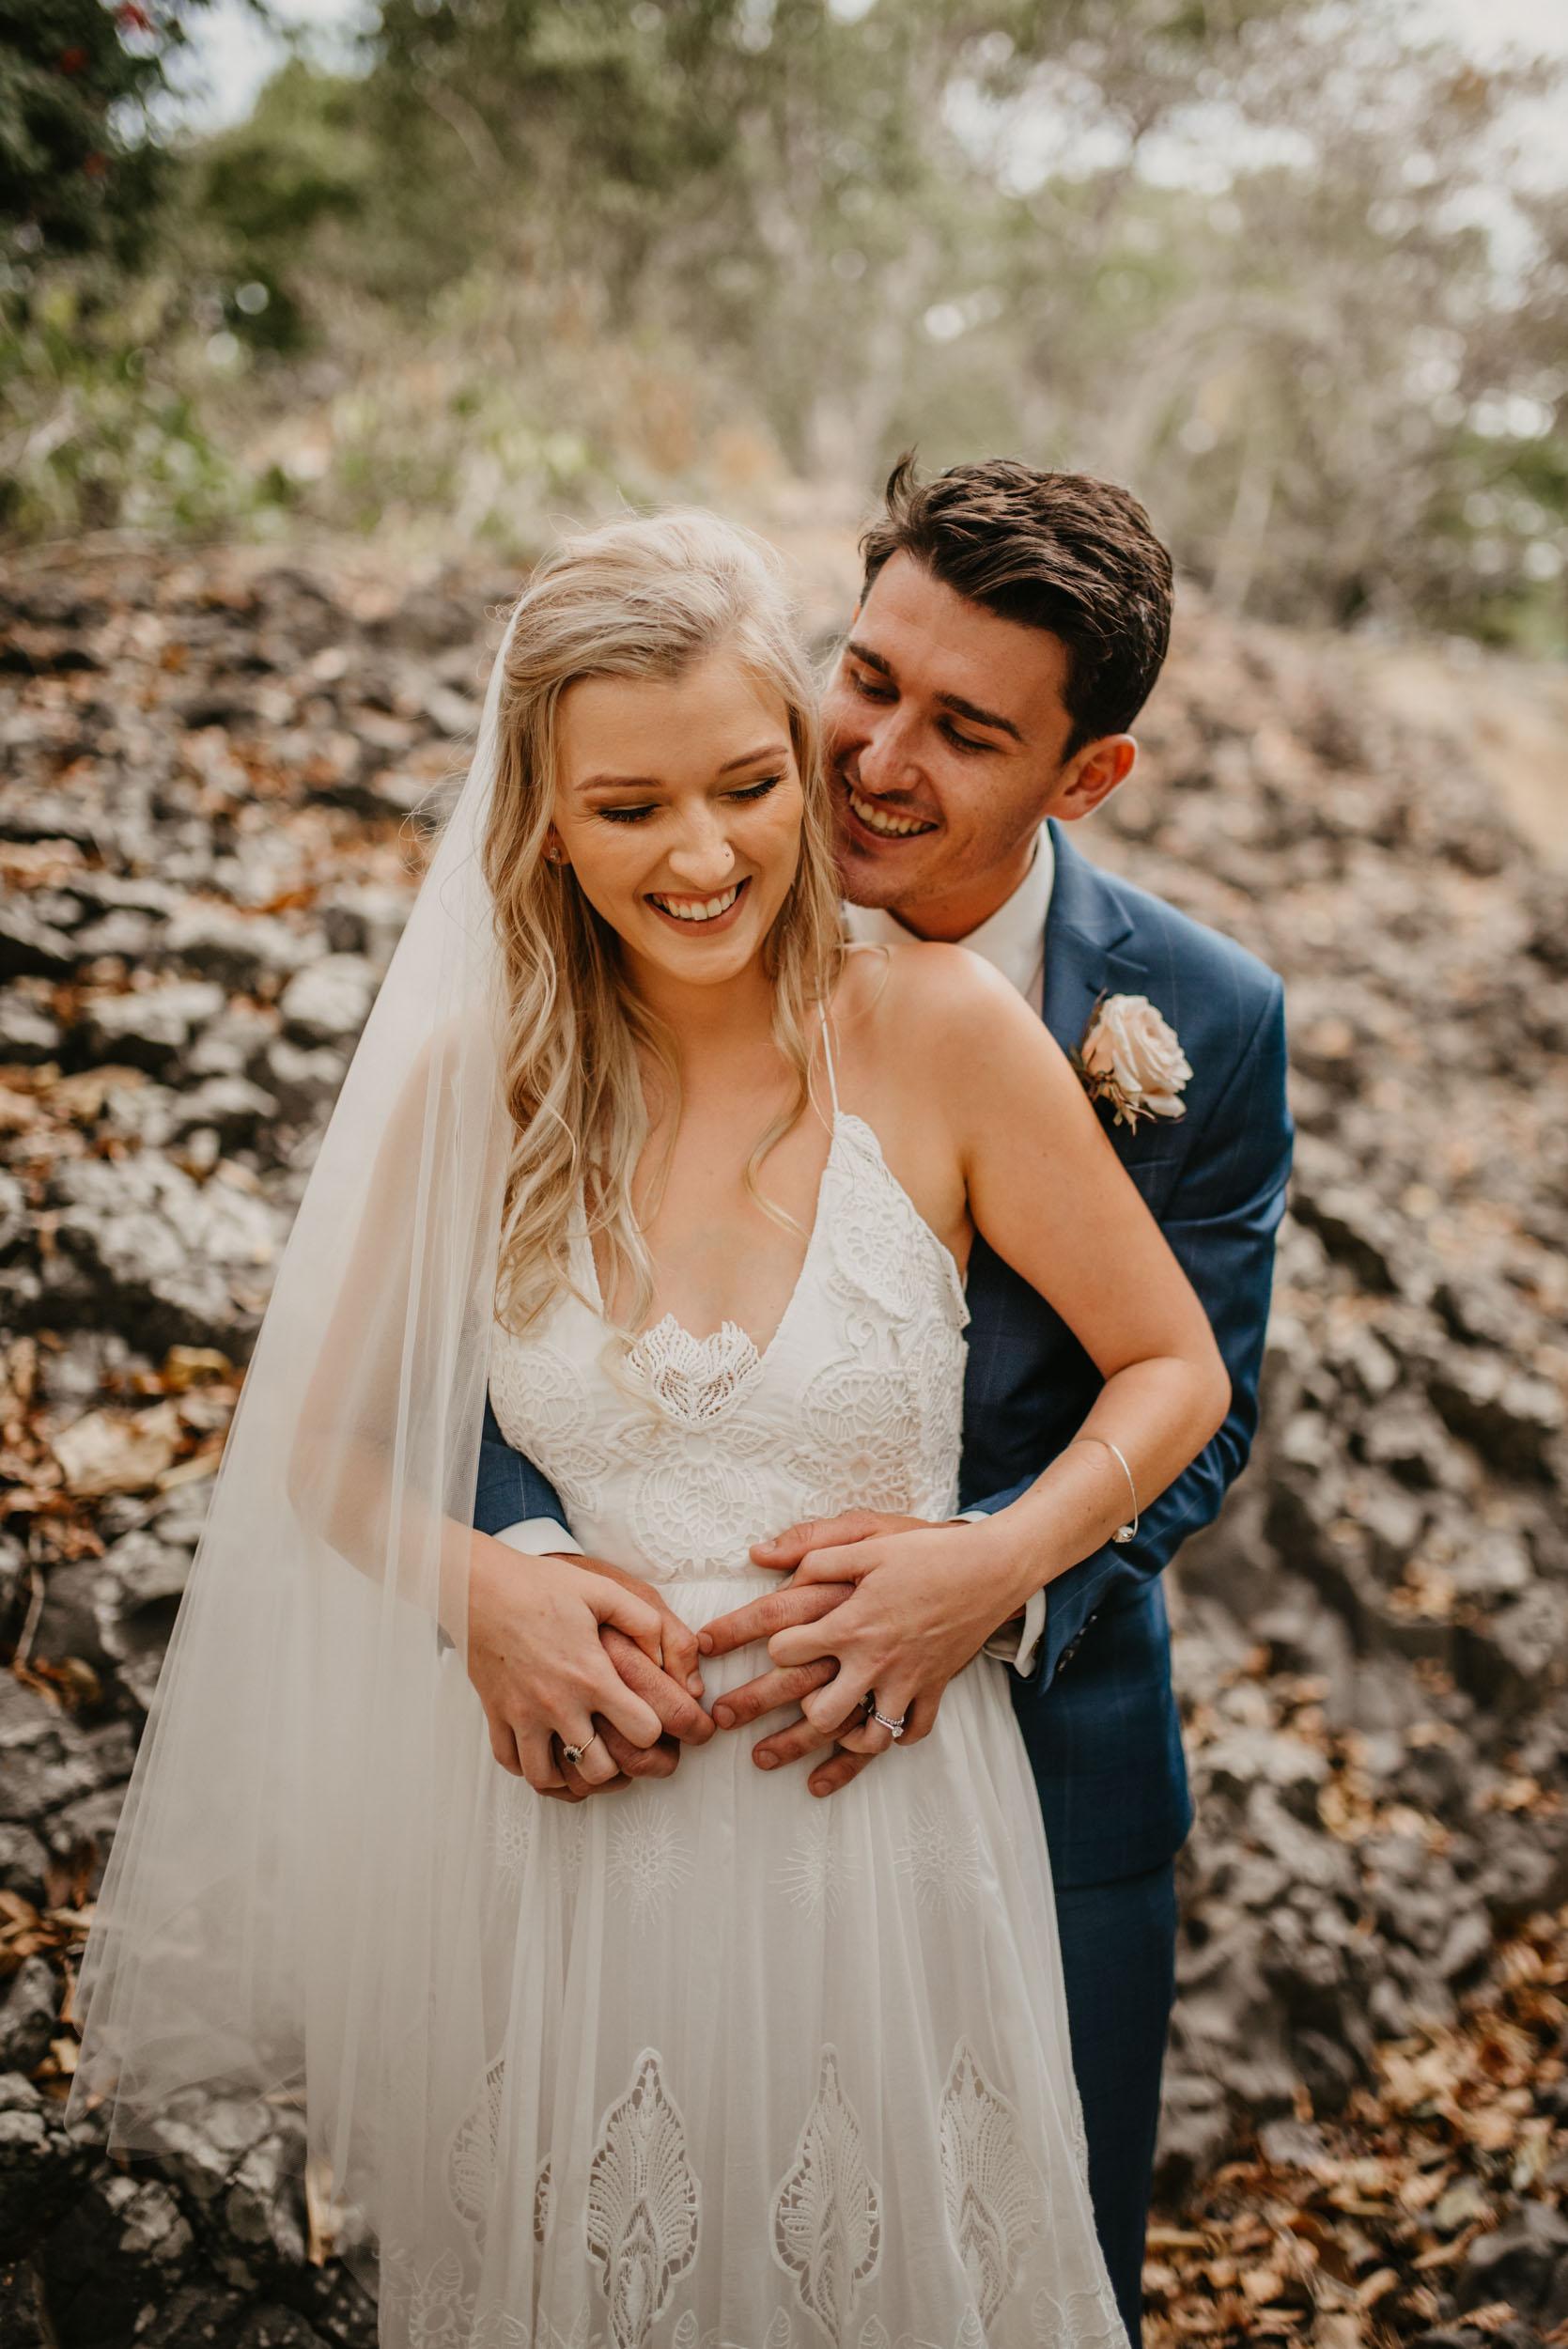 The Raw Photographer - Cairns Wedding Photographer - Laloli - Cairns Garden Wedding - Wedding Dress-52.jpg